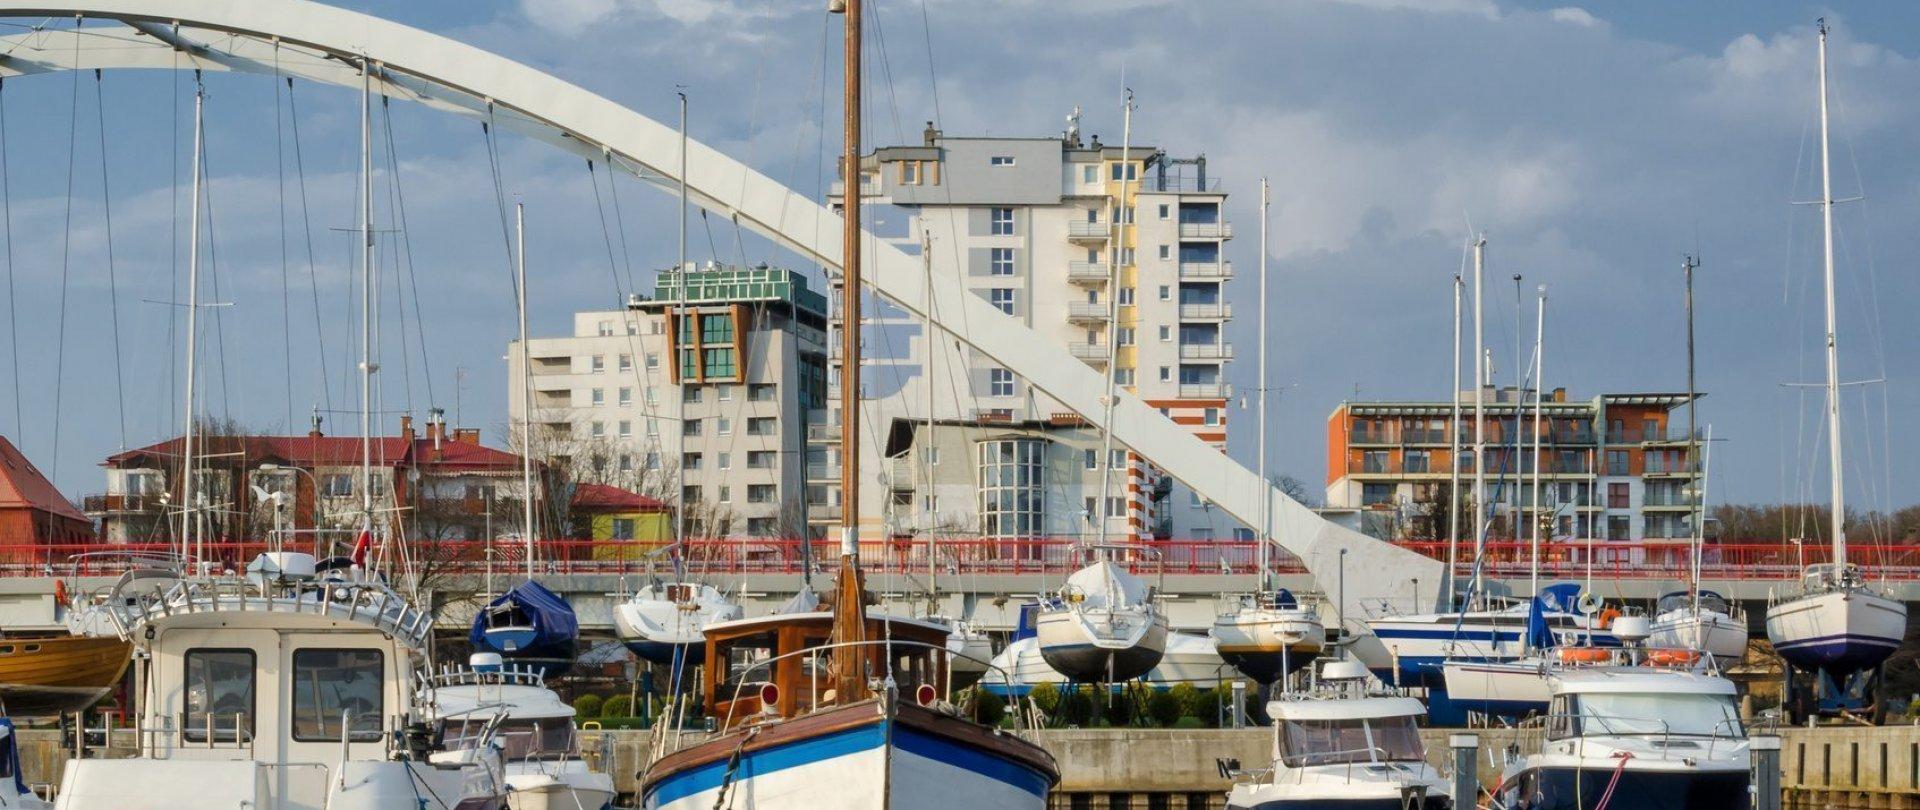 Skansen Morski w Kołobrzegu